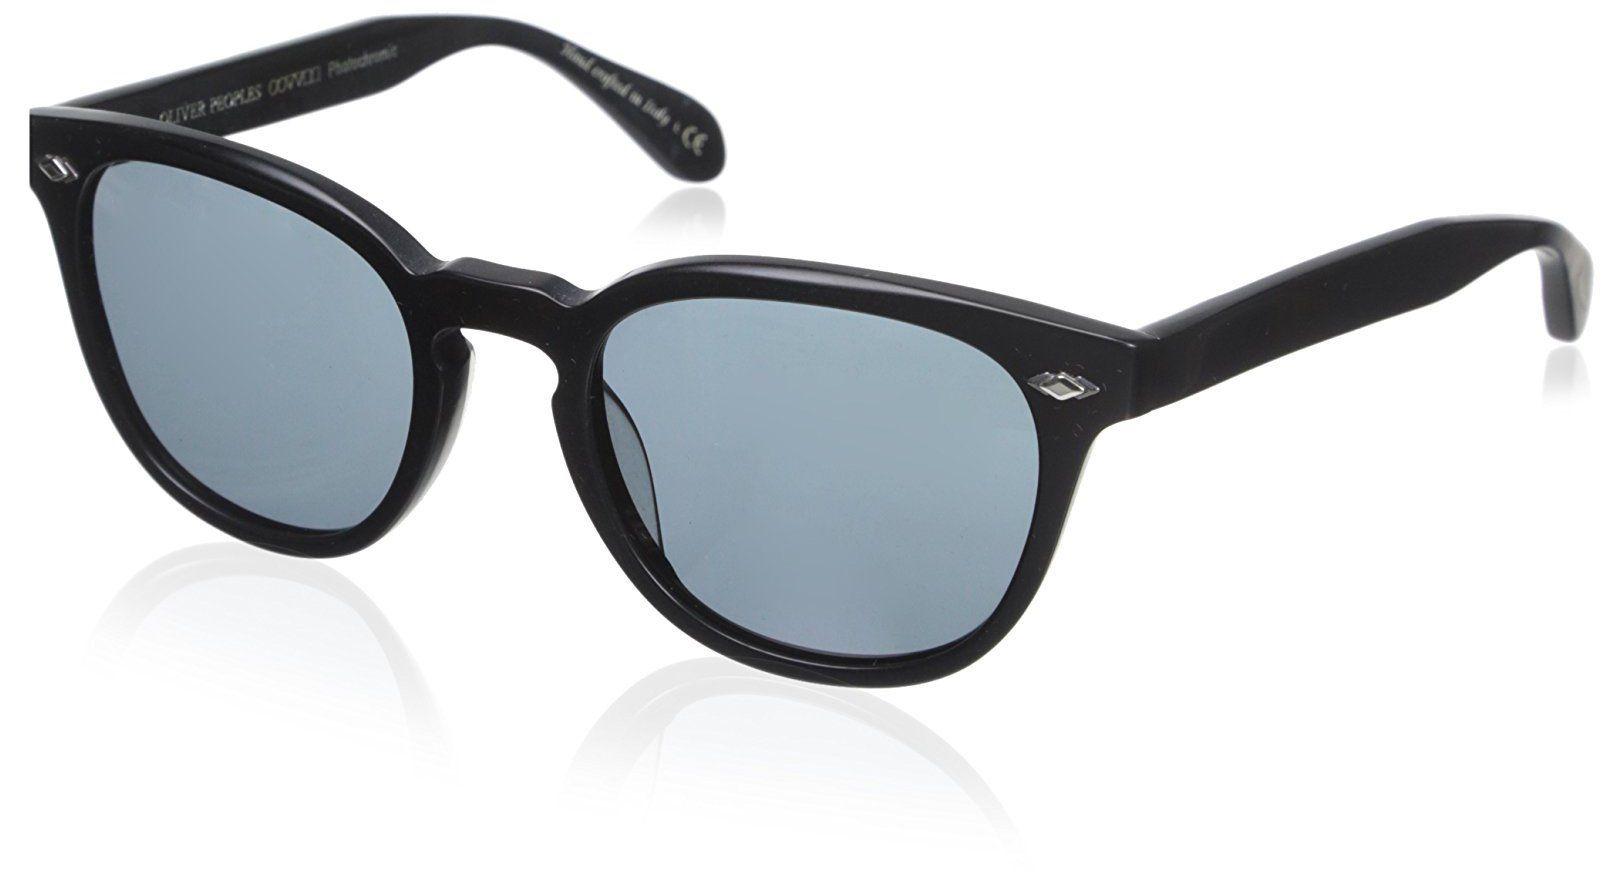 Oliver Peoples OV5315SU Unisex Sheldrake Plus Sunglasses, Semi Matte Black. OV5315SU; Case included.